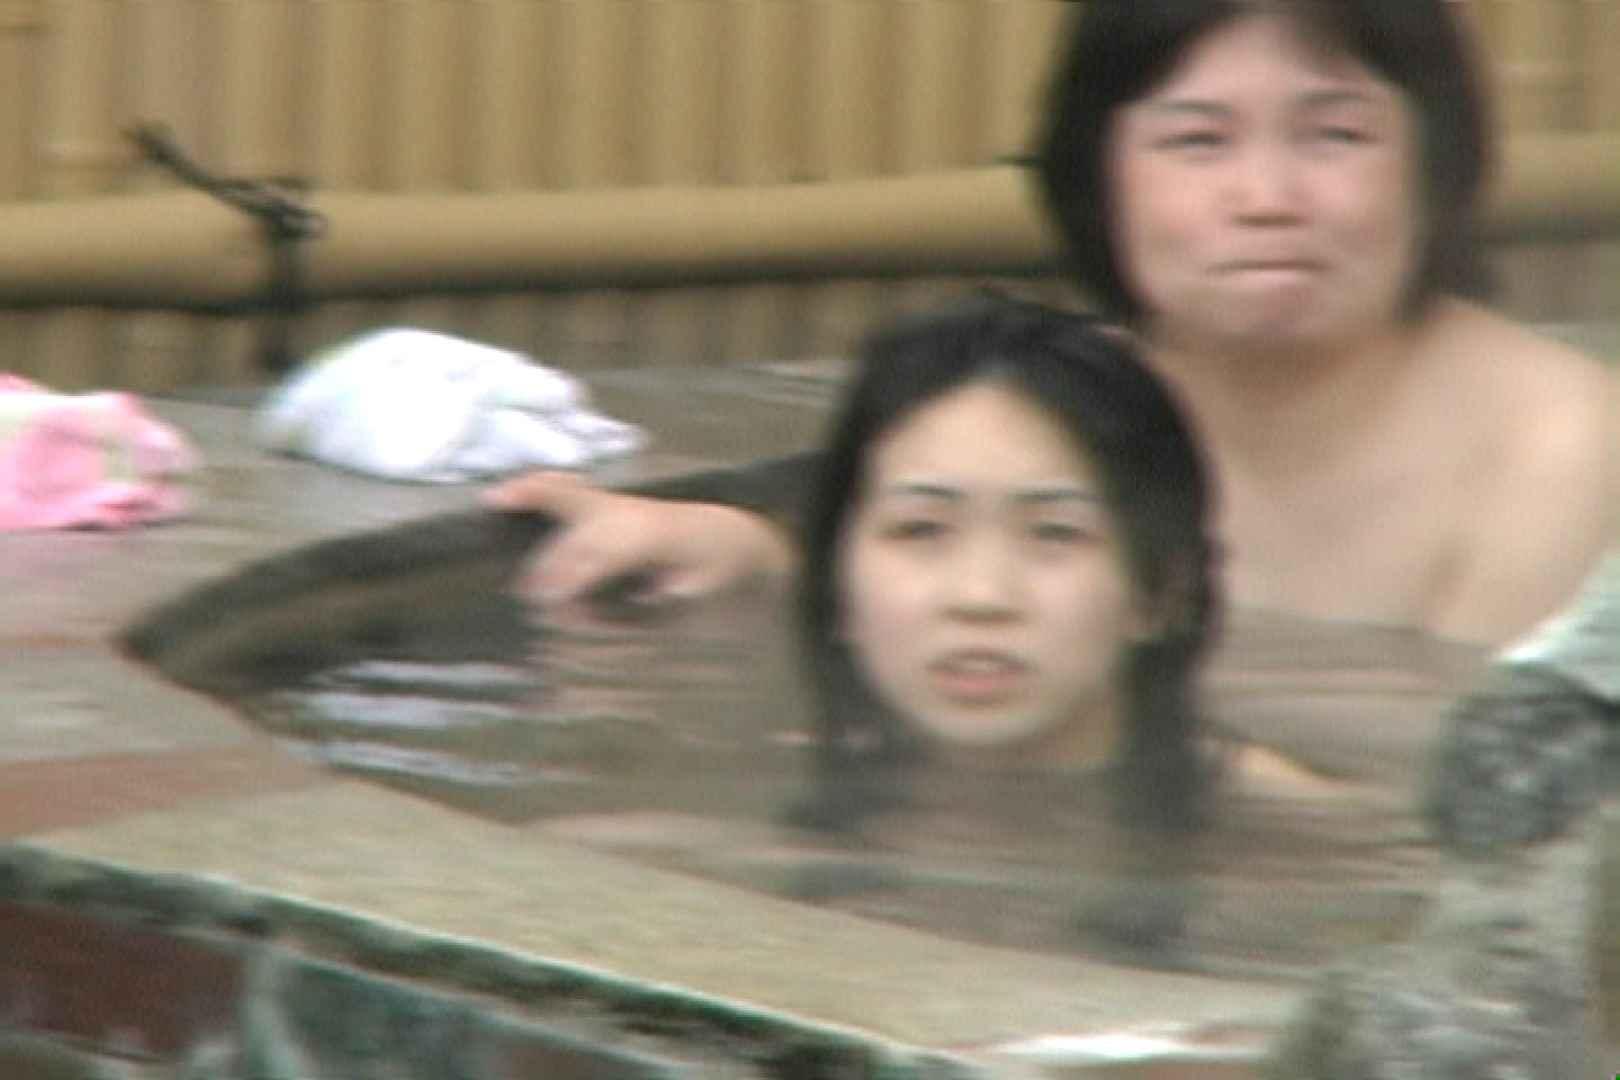 Aquaな露天風呂Vol.646 OLセックス | 盗撮  97画像 13